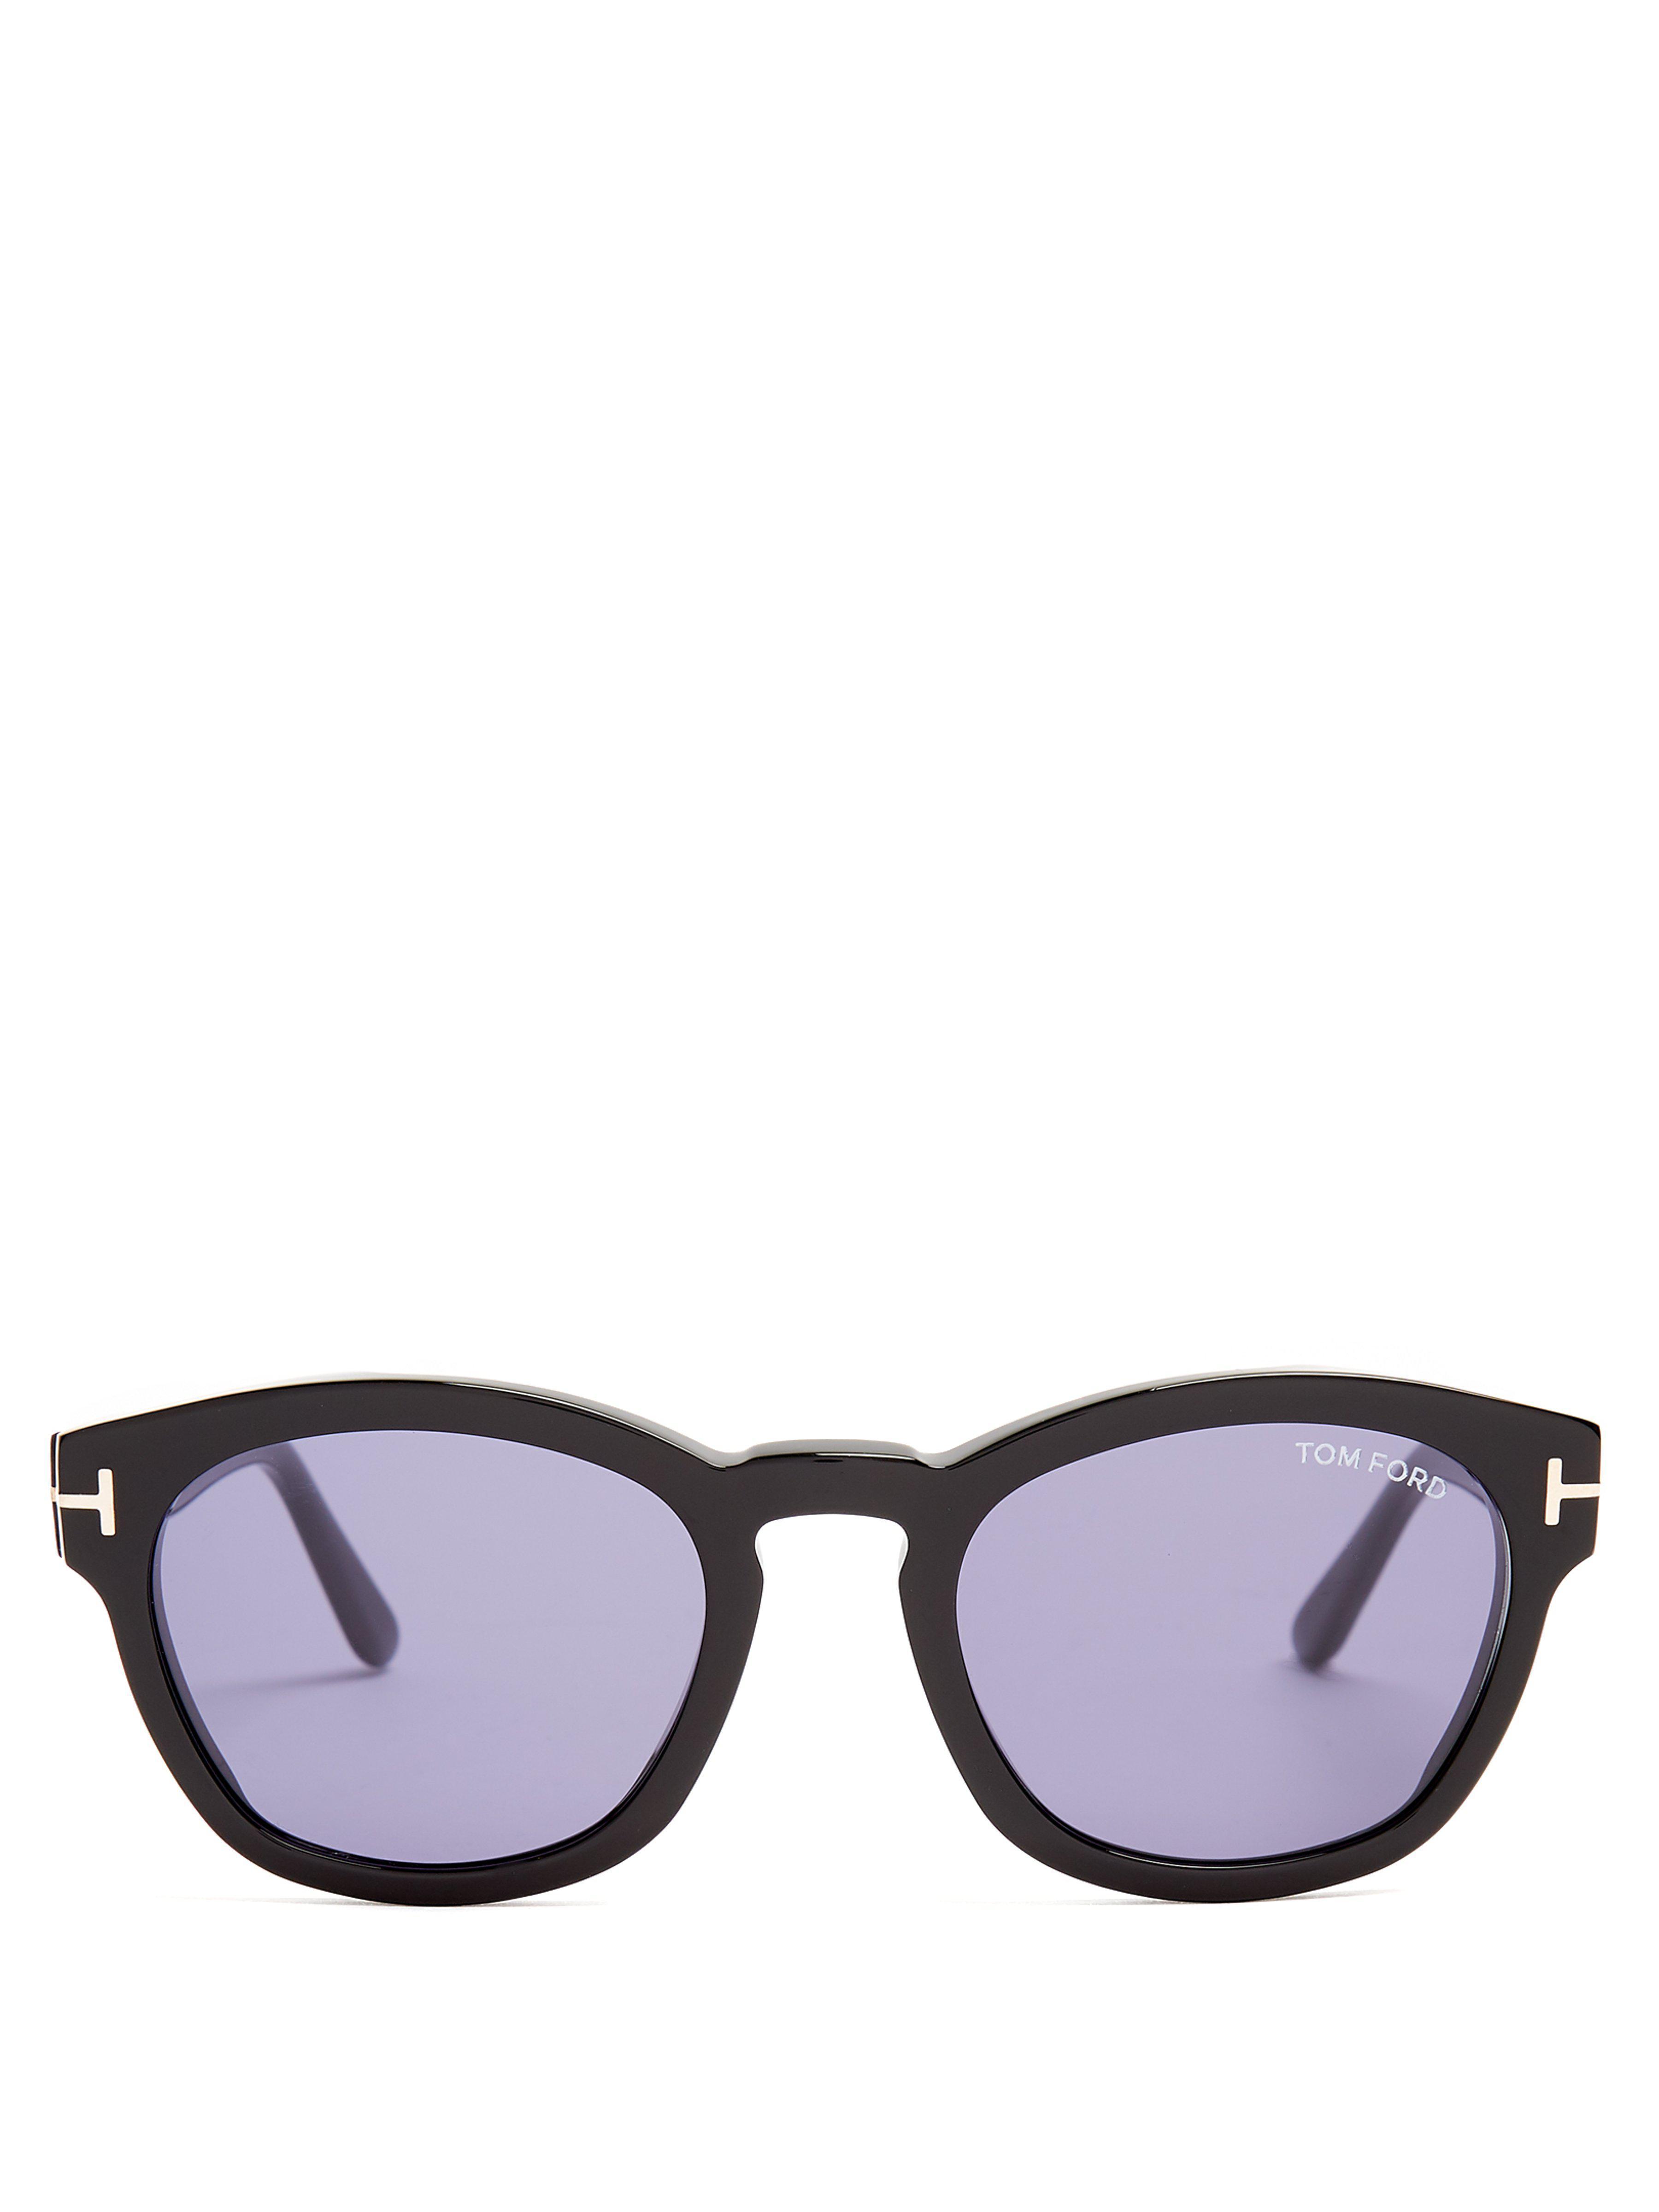 5674b56a560 Tom Ford - Black Bryan Square Frame Sunglasses for Men - Lyst. View  fullscreen